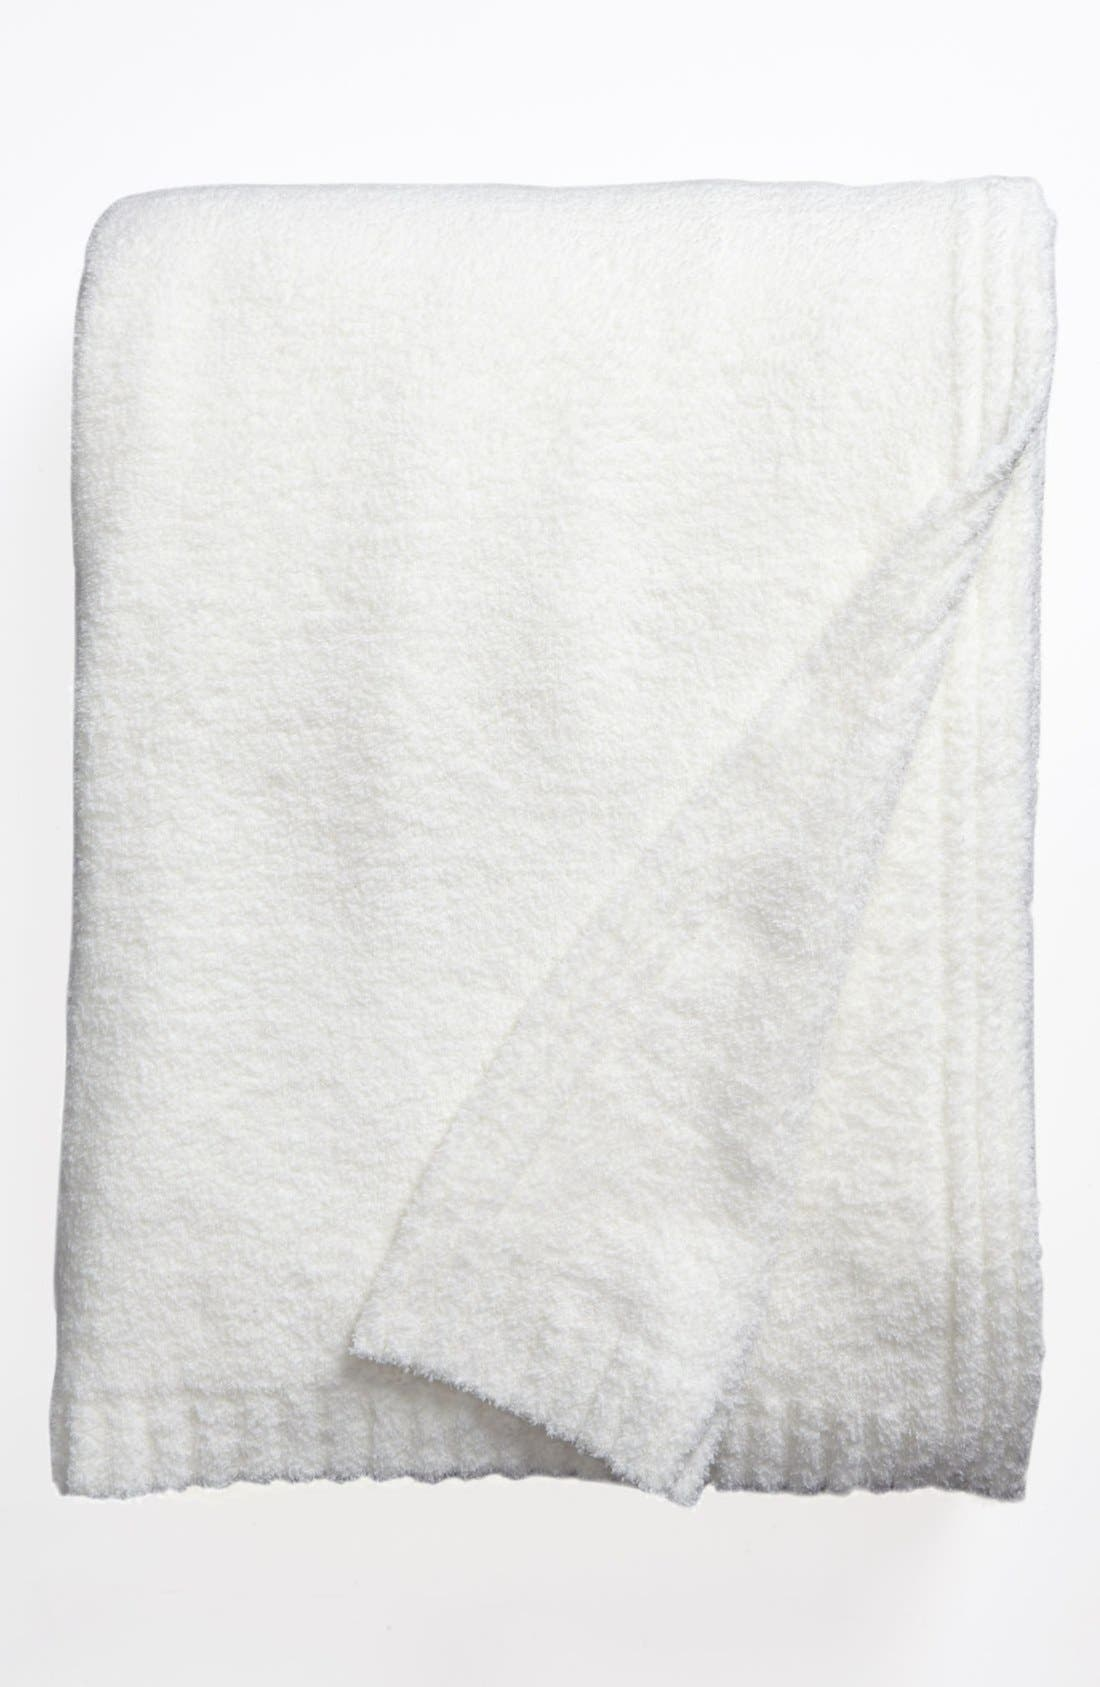 Alternate Image 1 Selected - Nordstrom at Home 'Butter' Knit Blanket